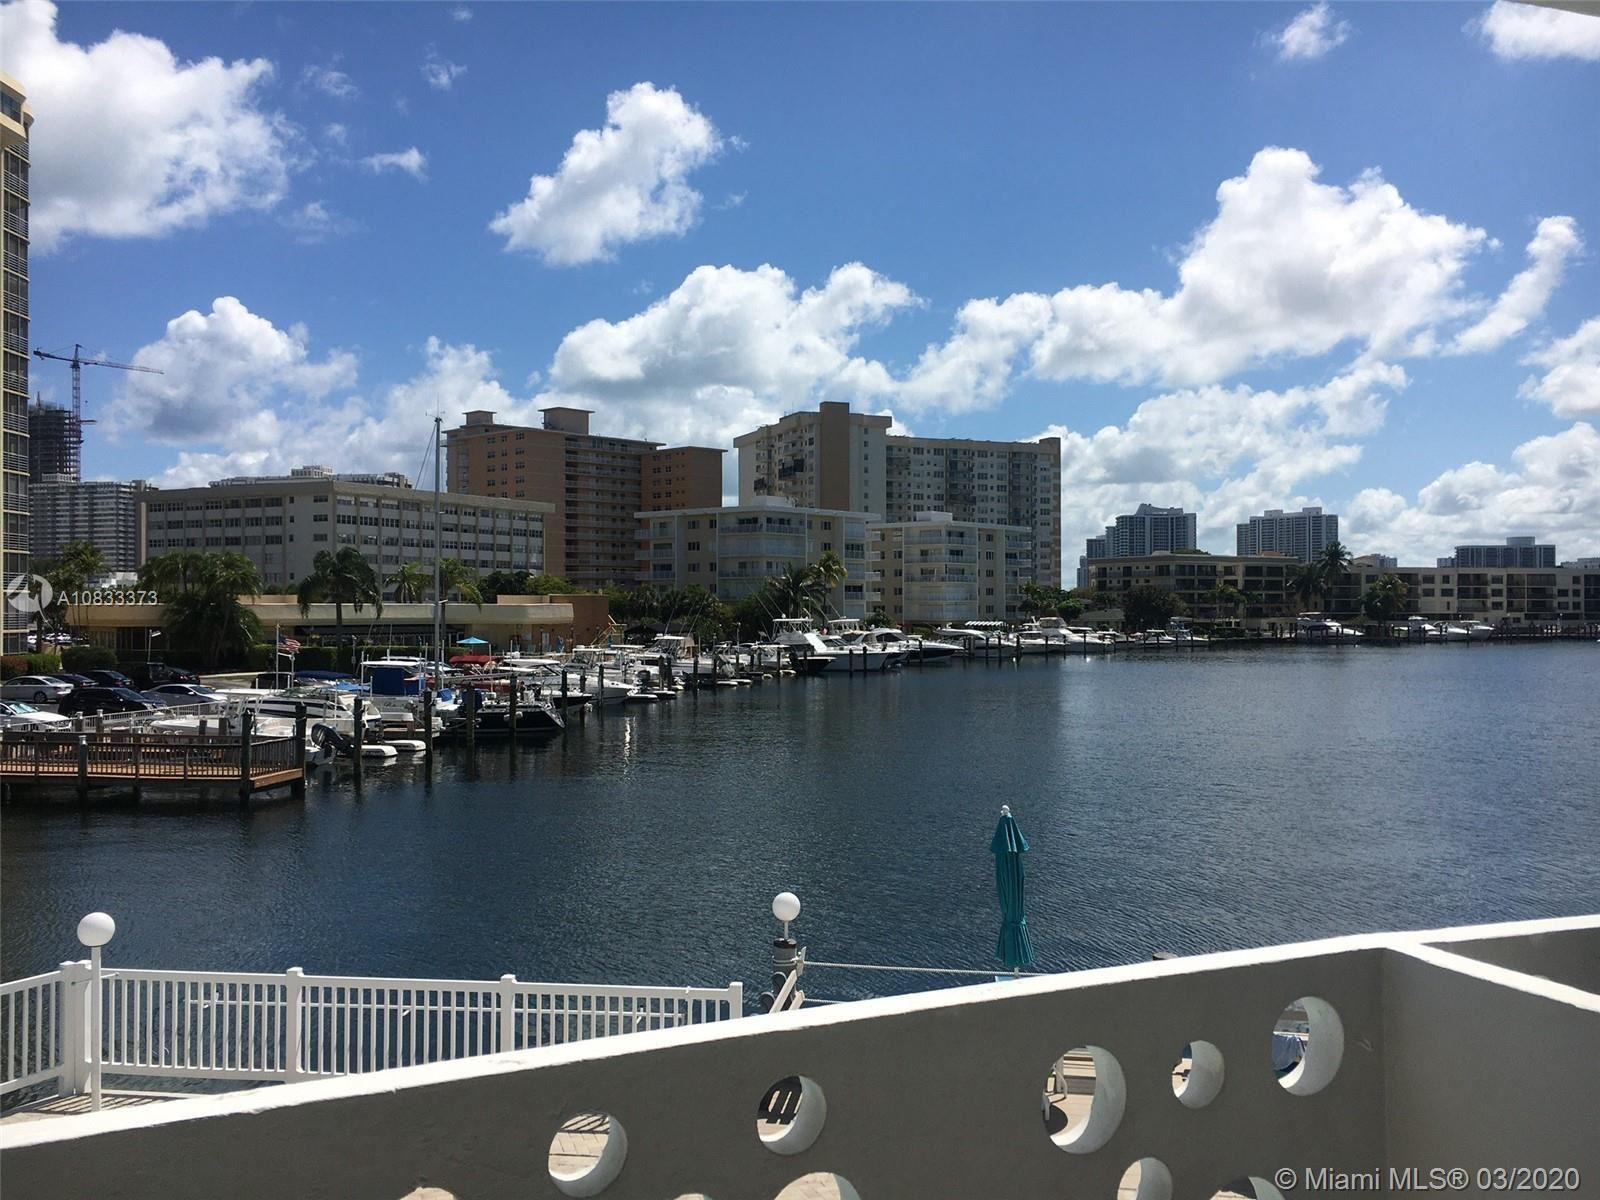 2500 Diana Dr #216, Hallandale Beach, FL 33009 - #: A10833373